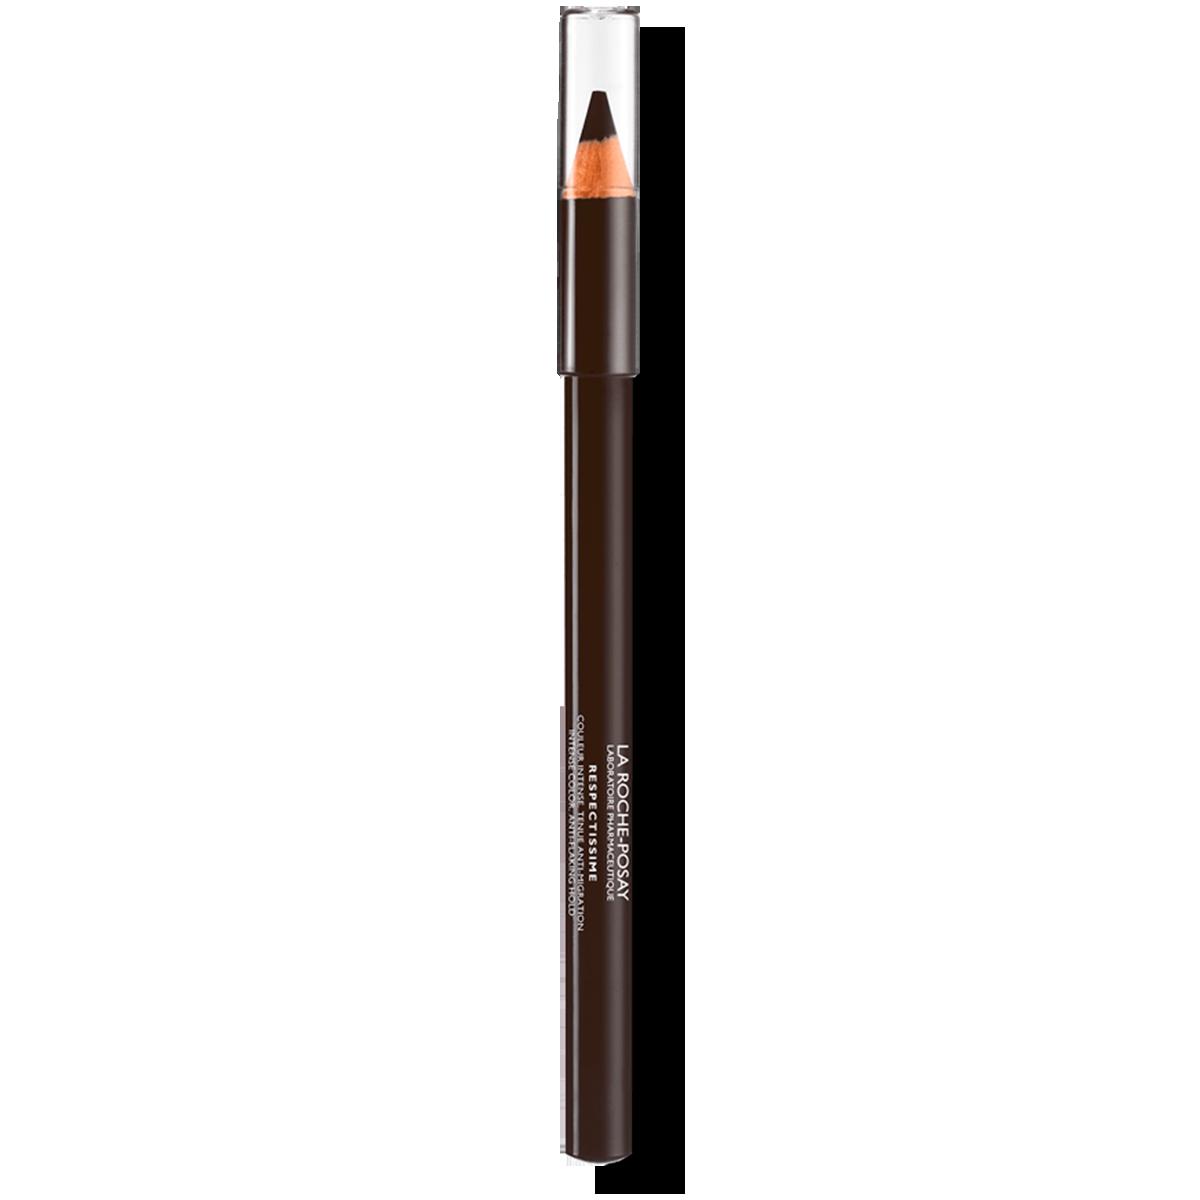 La Roche Posay Känslig Toleriane Make up EYE PENCIL Brown 3337872410